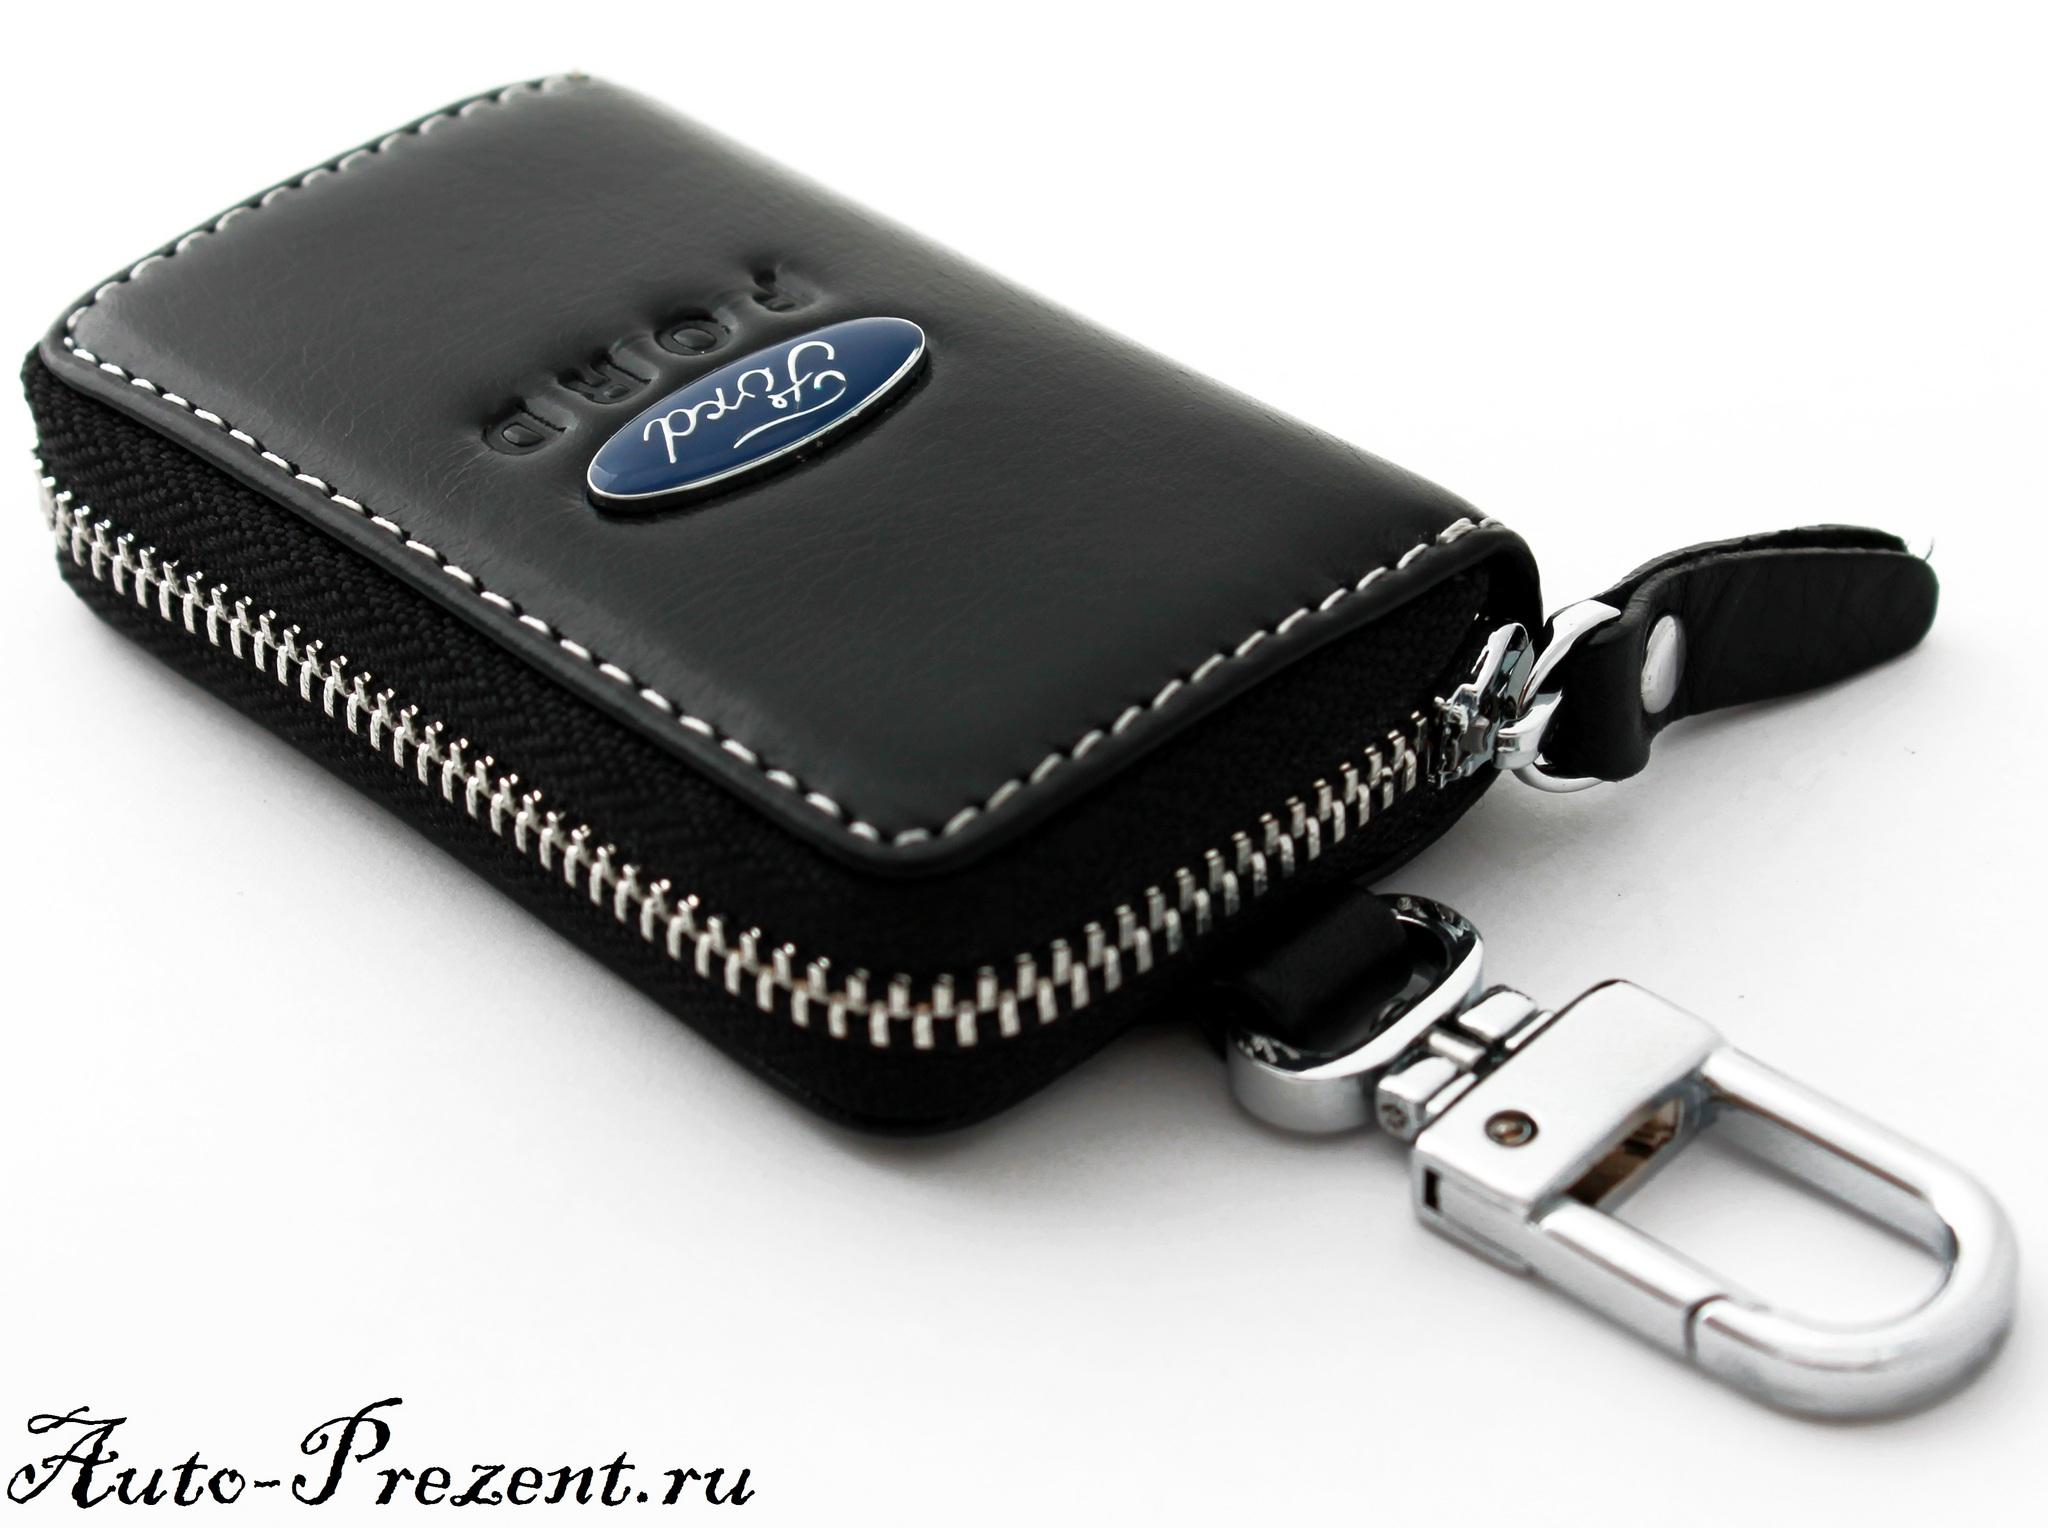 Кожаный чехол для ключа с логотипом FORD